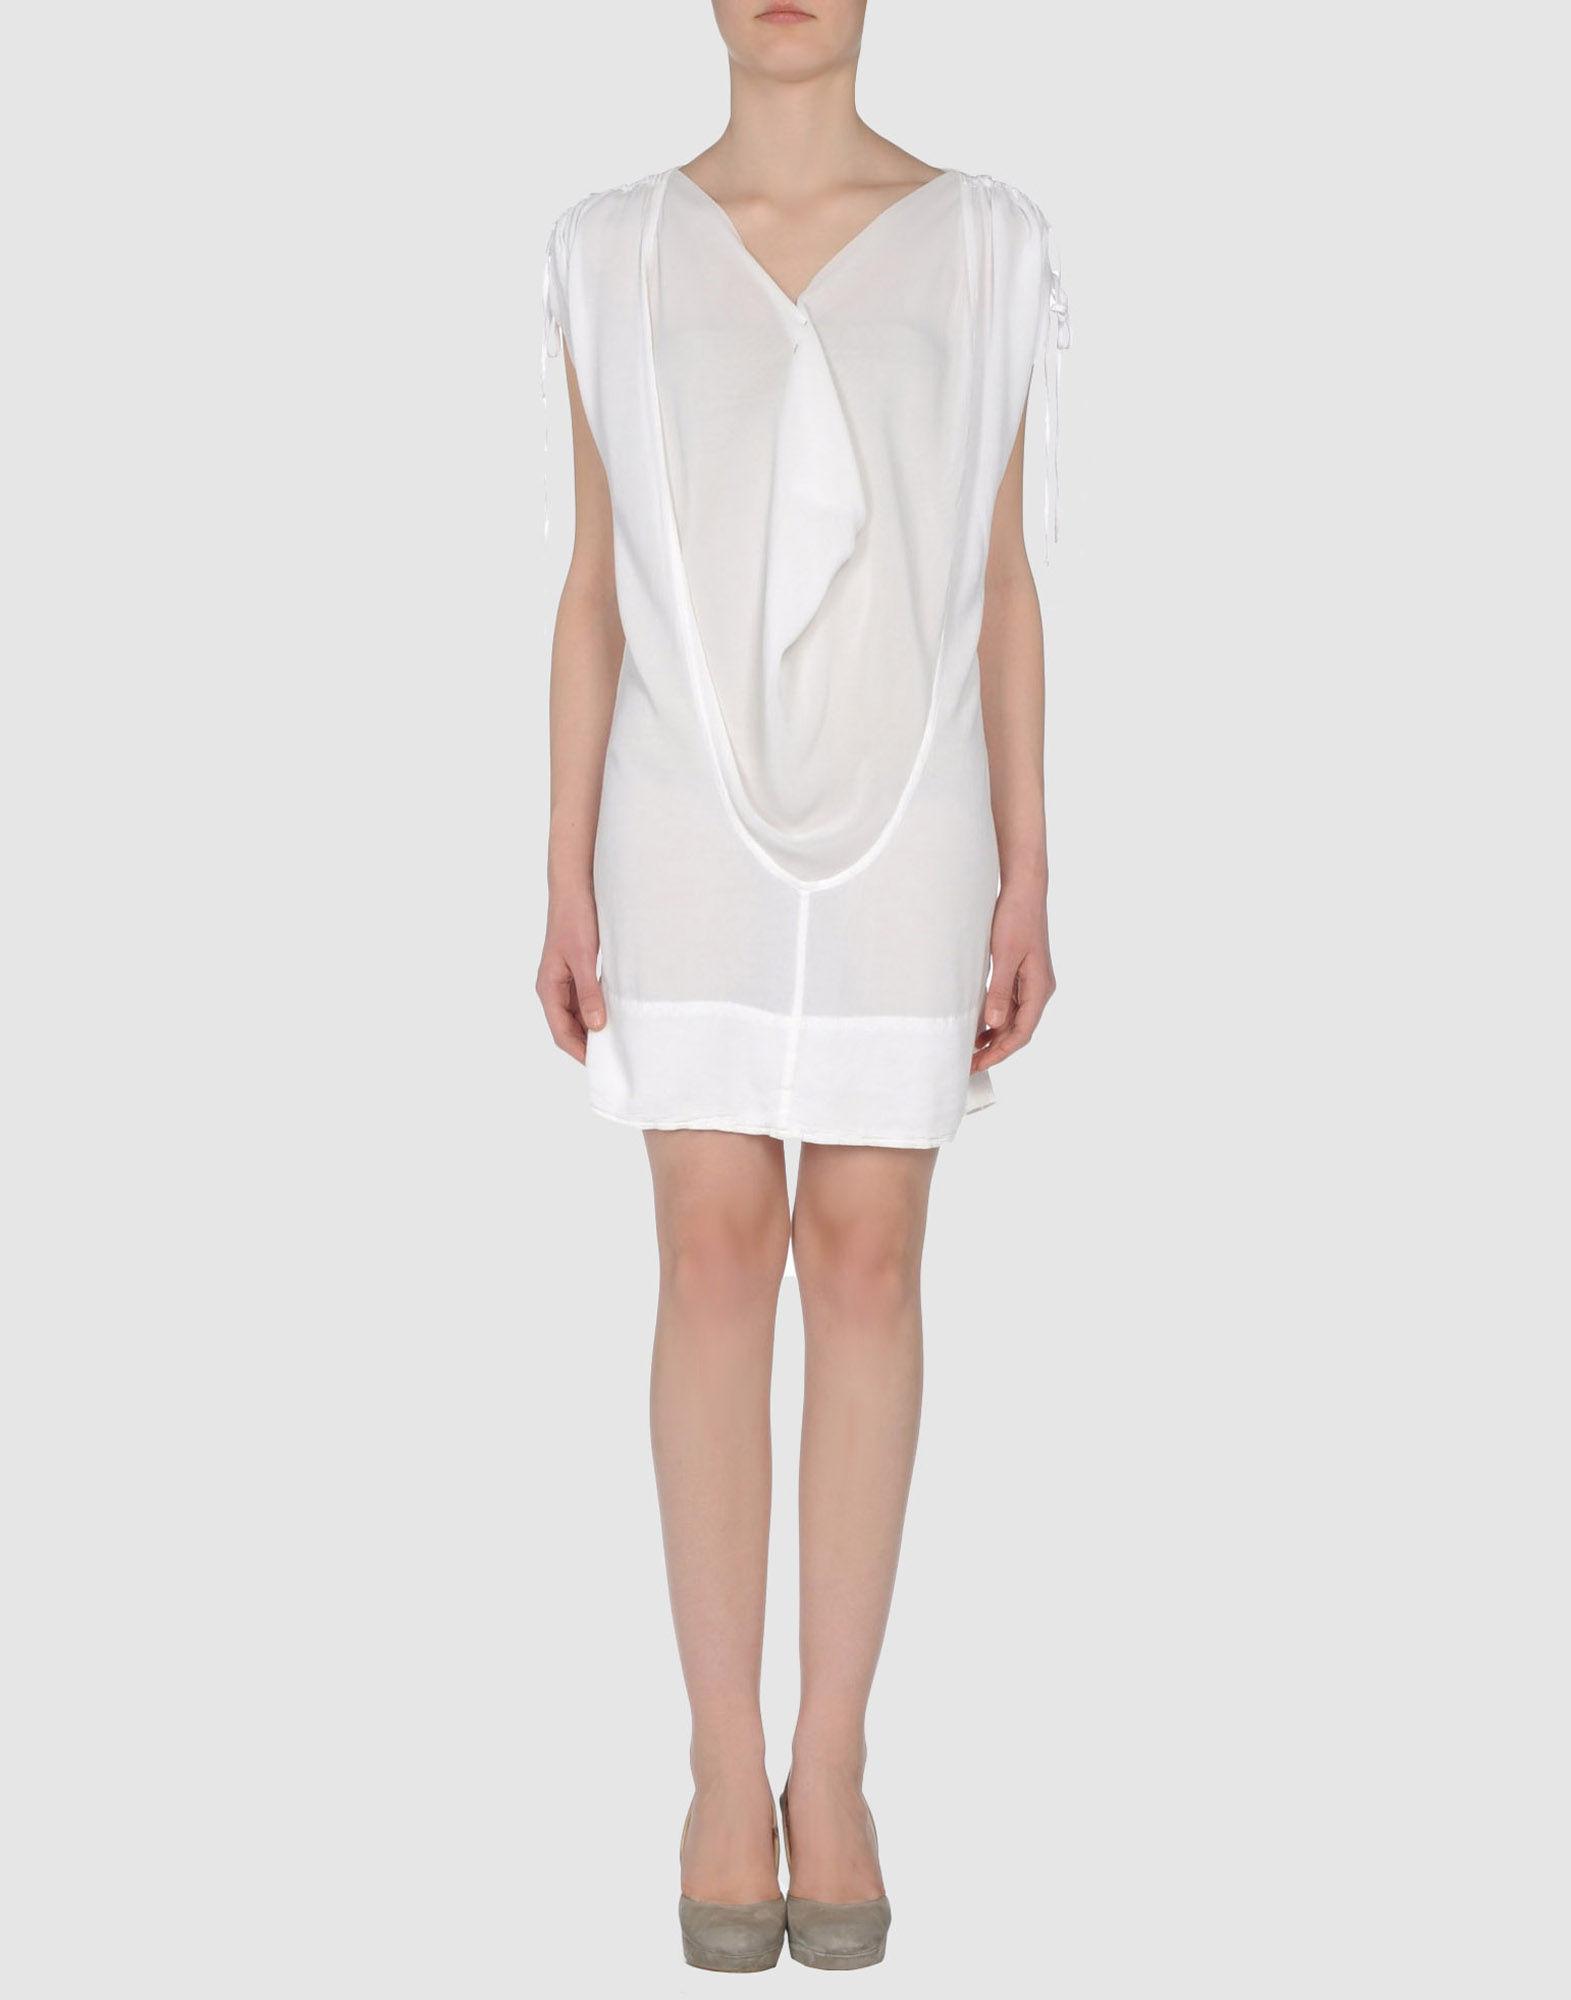 Baby ceylon Short Dress in White